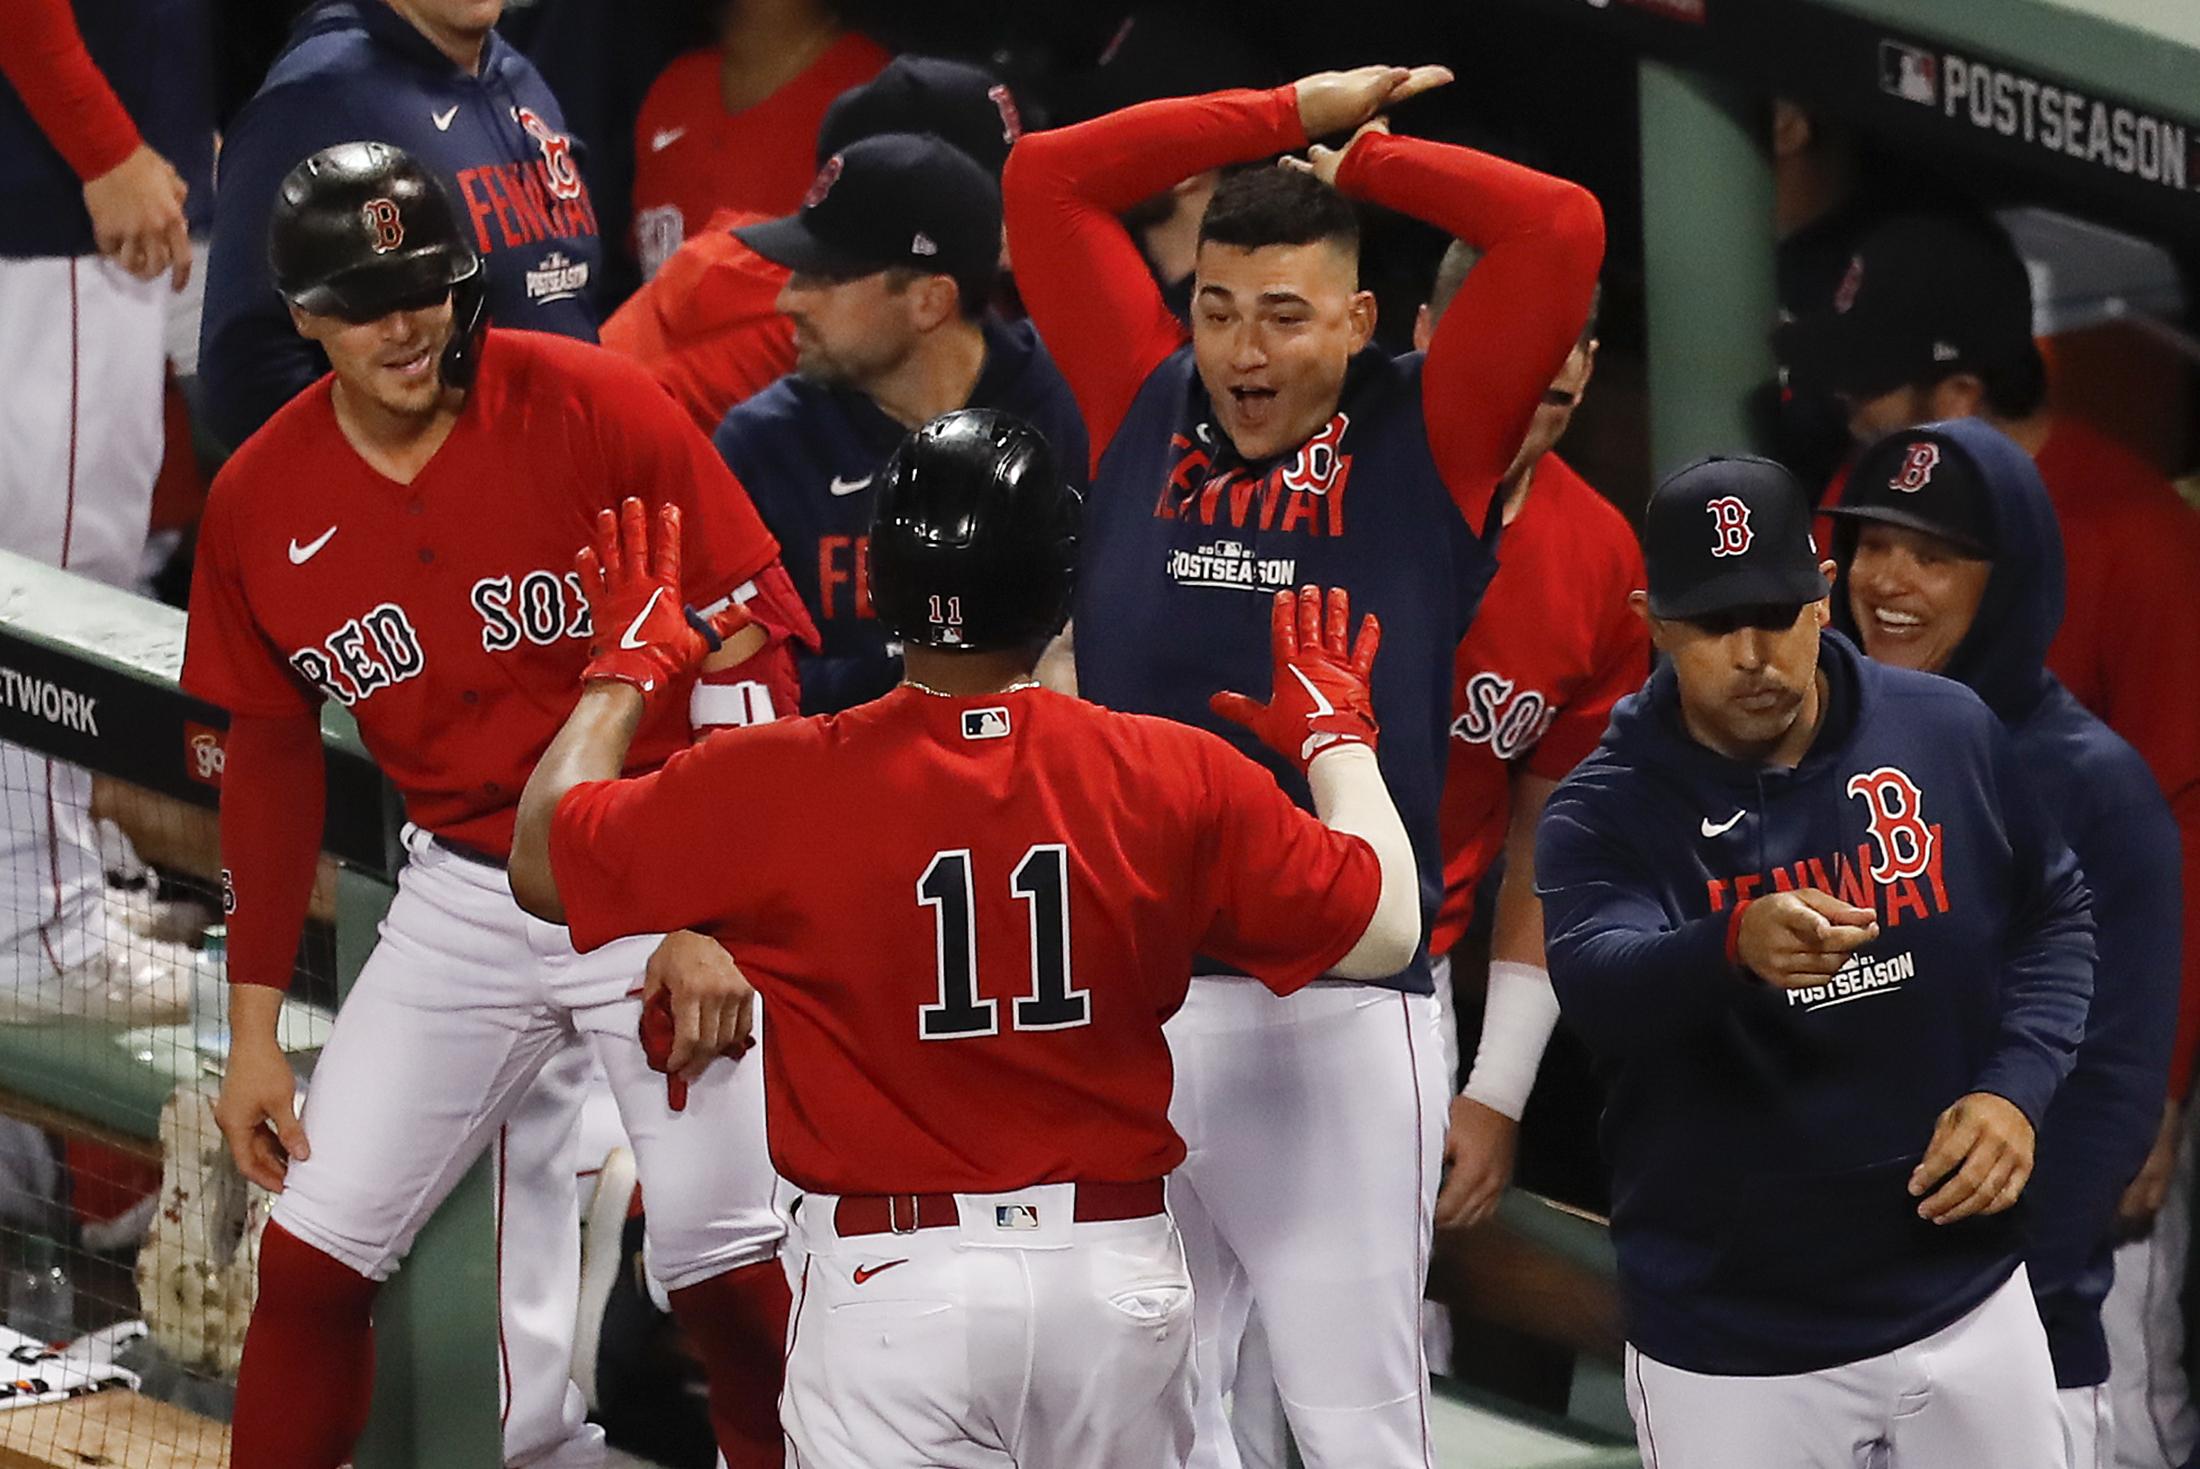 Kike Hernandez's Walk-Off RBI Gives Red Sox ALDS Series Win vs. Rays